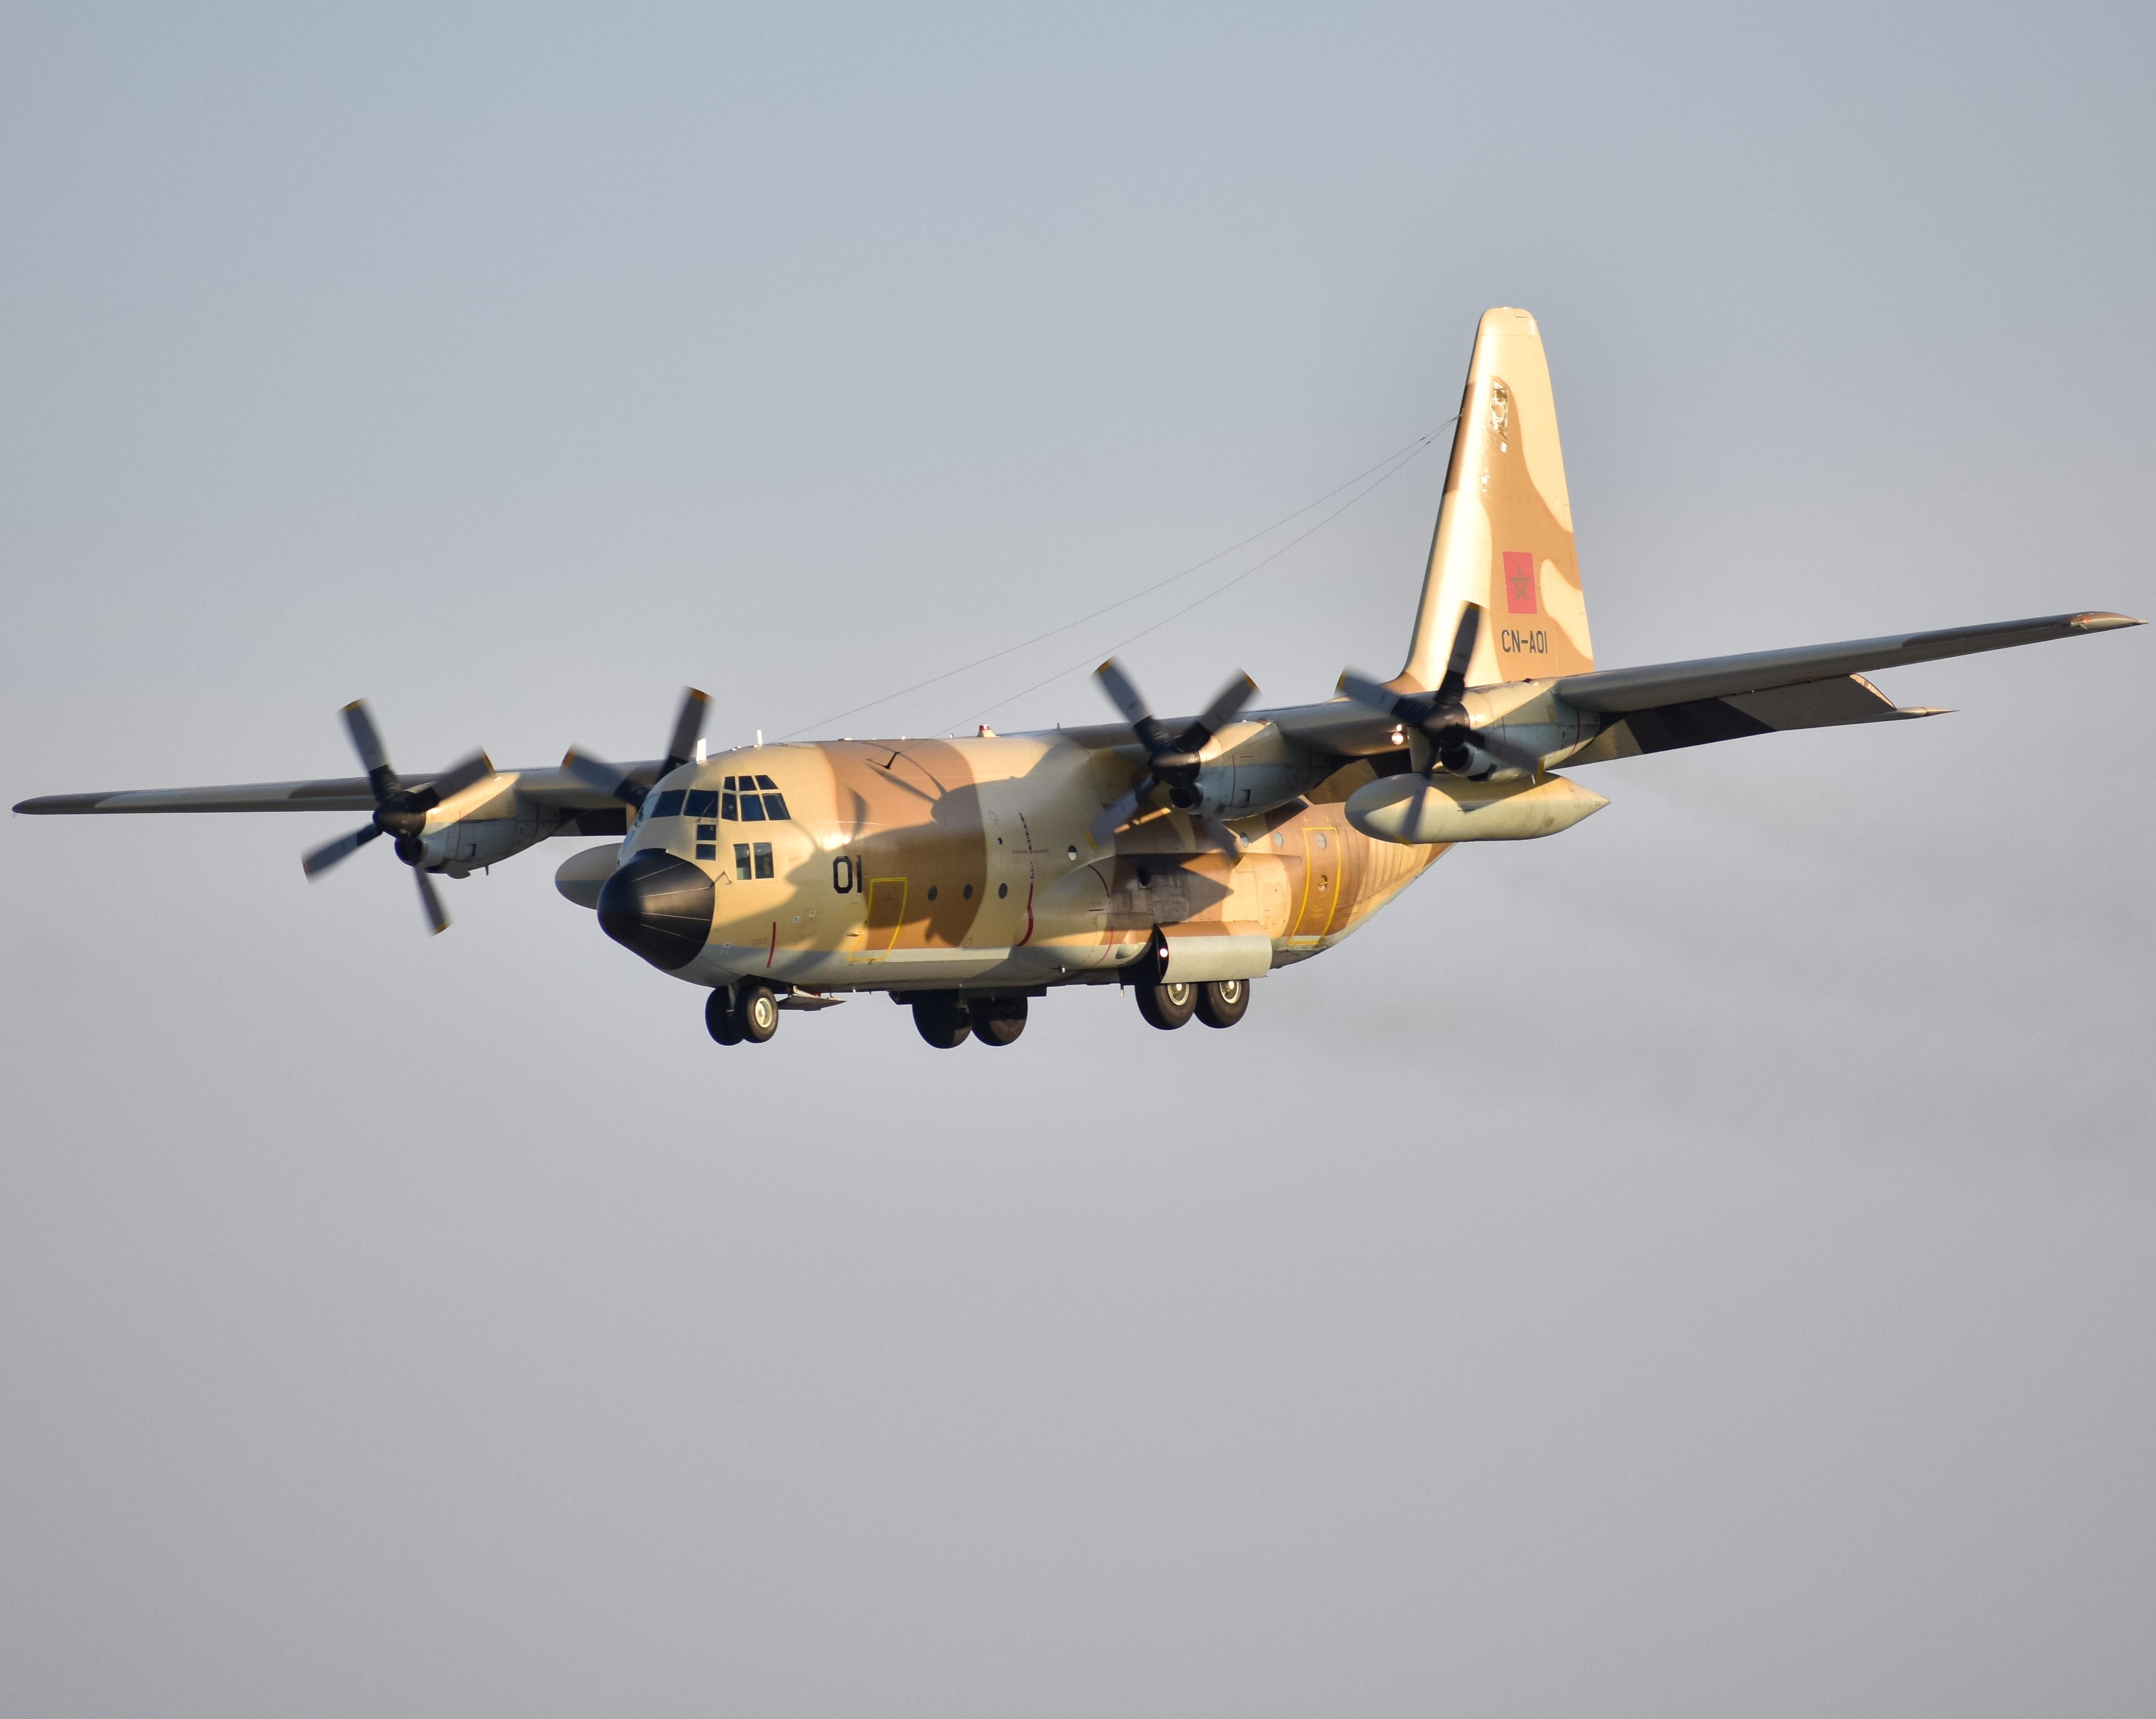 FRA: Photos d'avions de transport - Page 38 33792944548_54cef36fc9_o